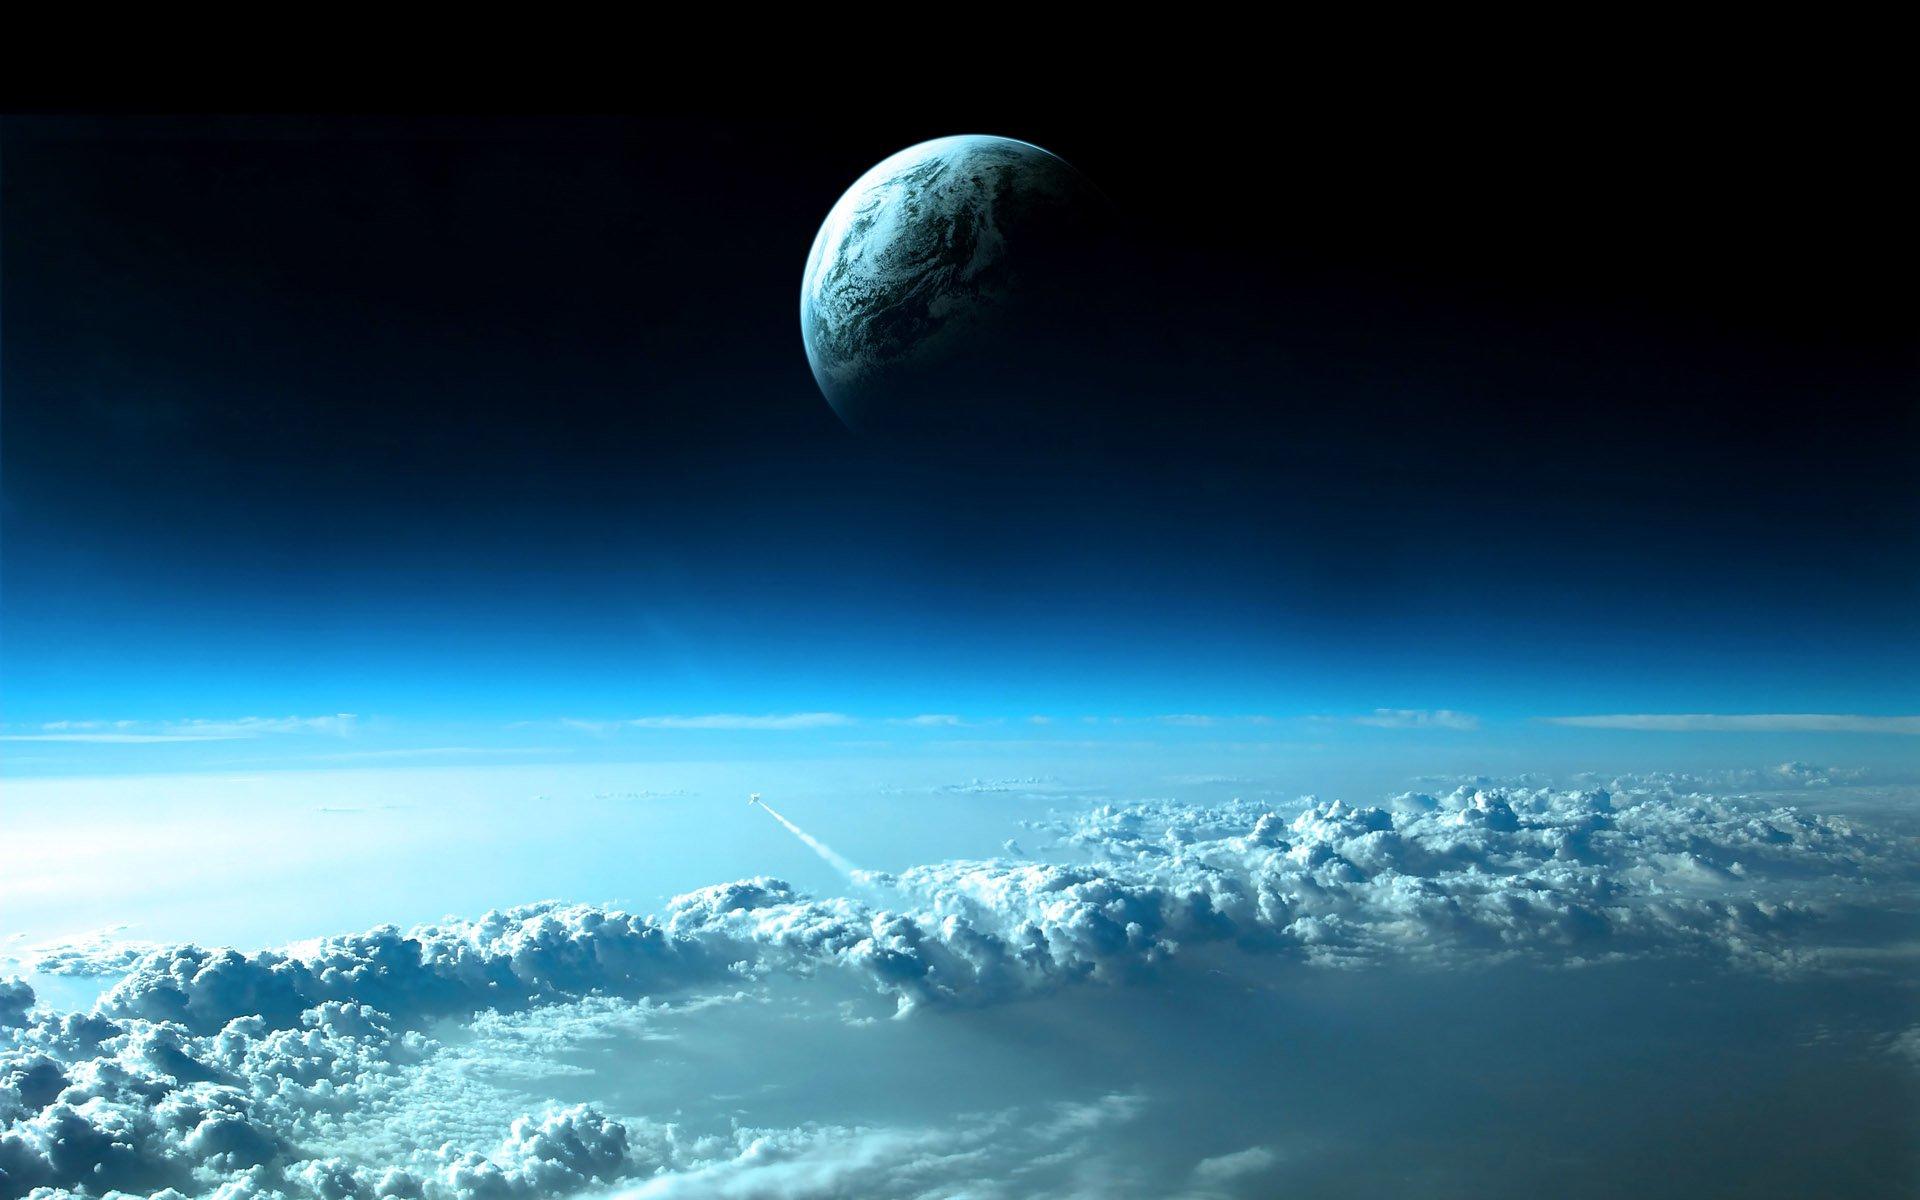 Научная Фантастика - Планетарный Ландшафт  Облака Планета Земля/природа Обои